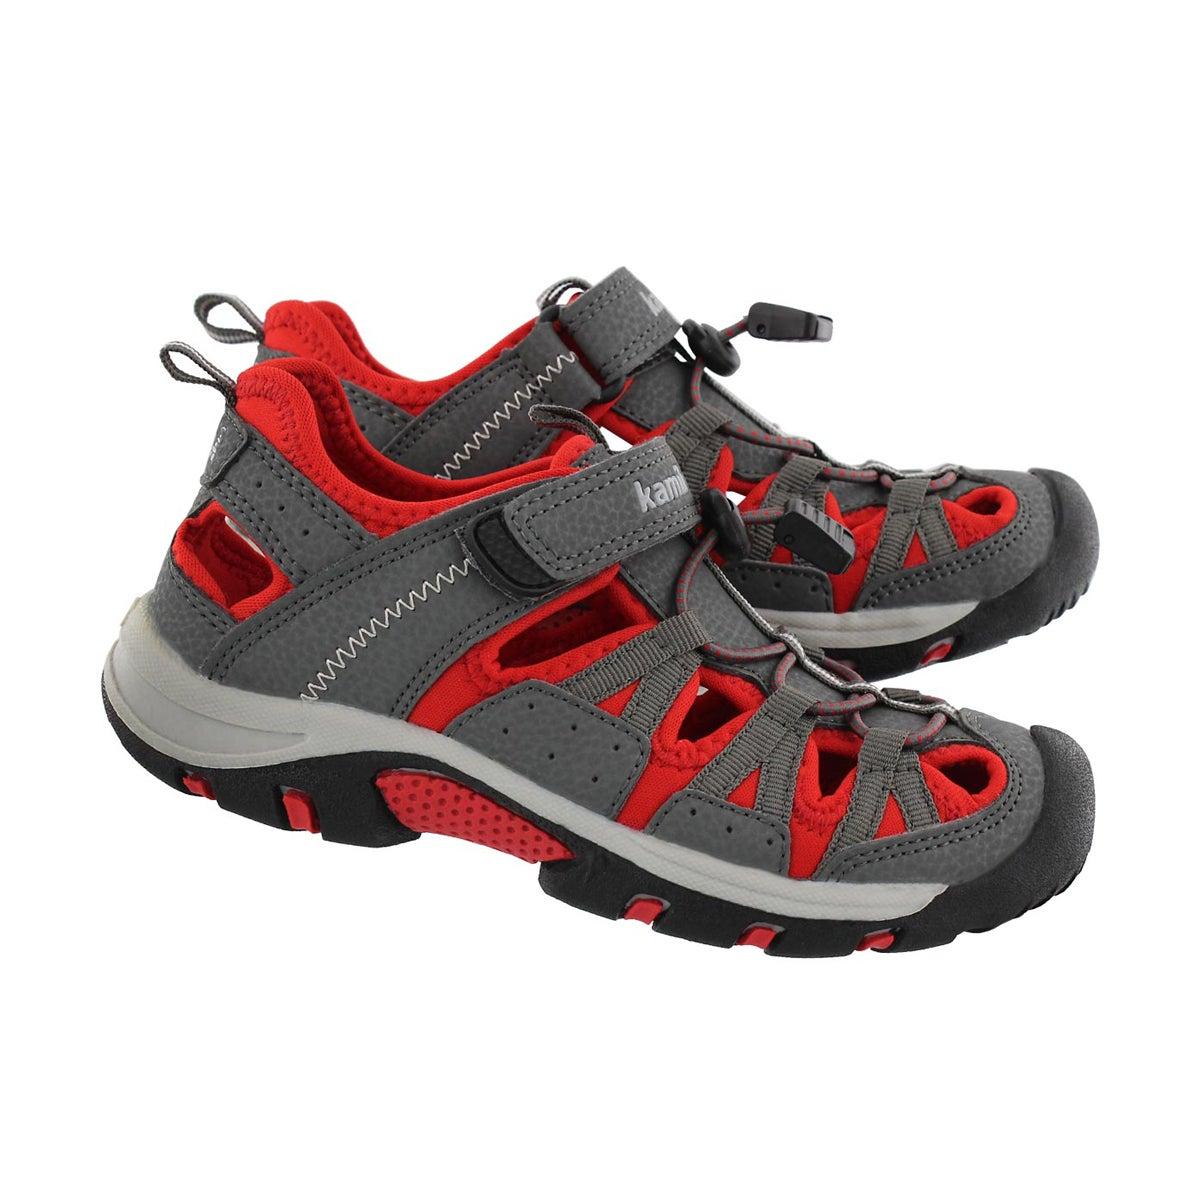 Bys Wildcat grey/red fisherman sandal